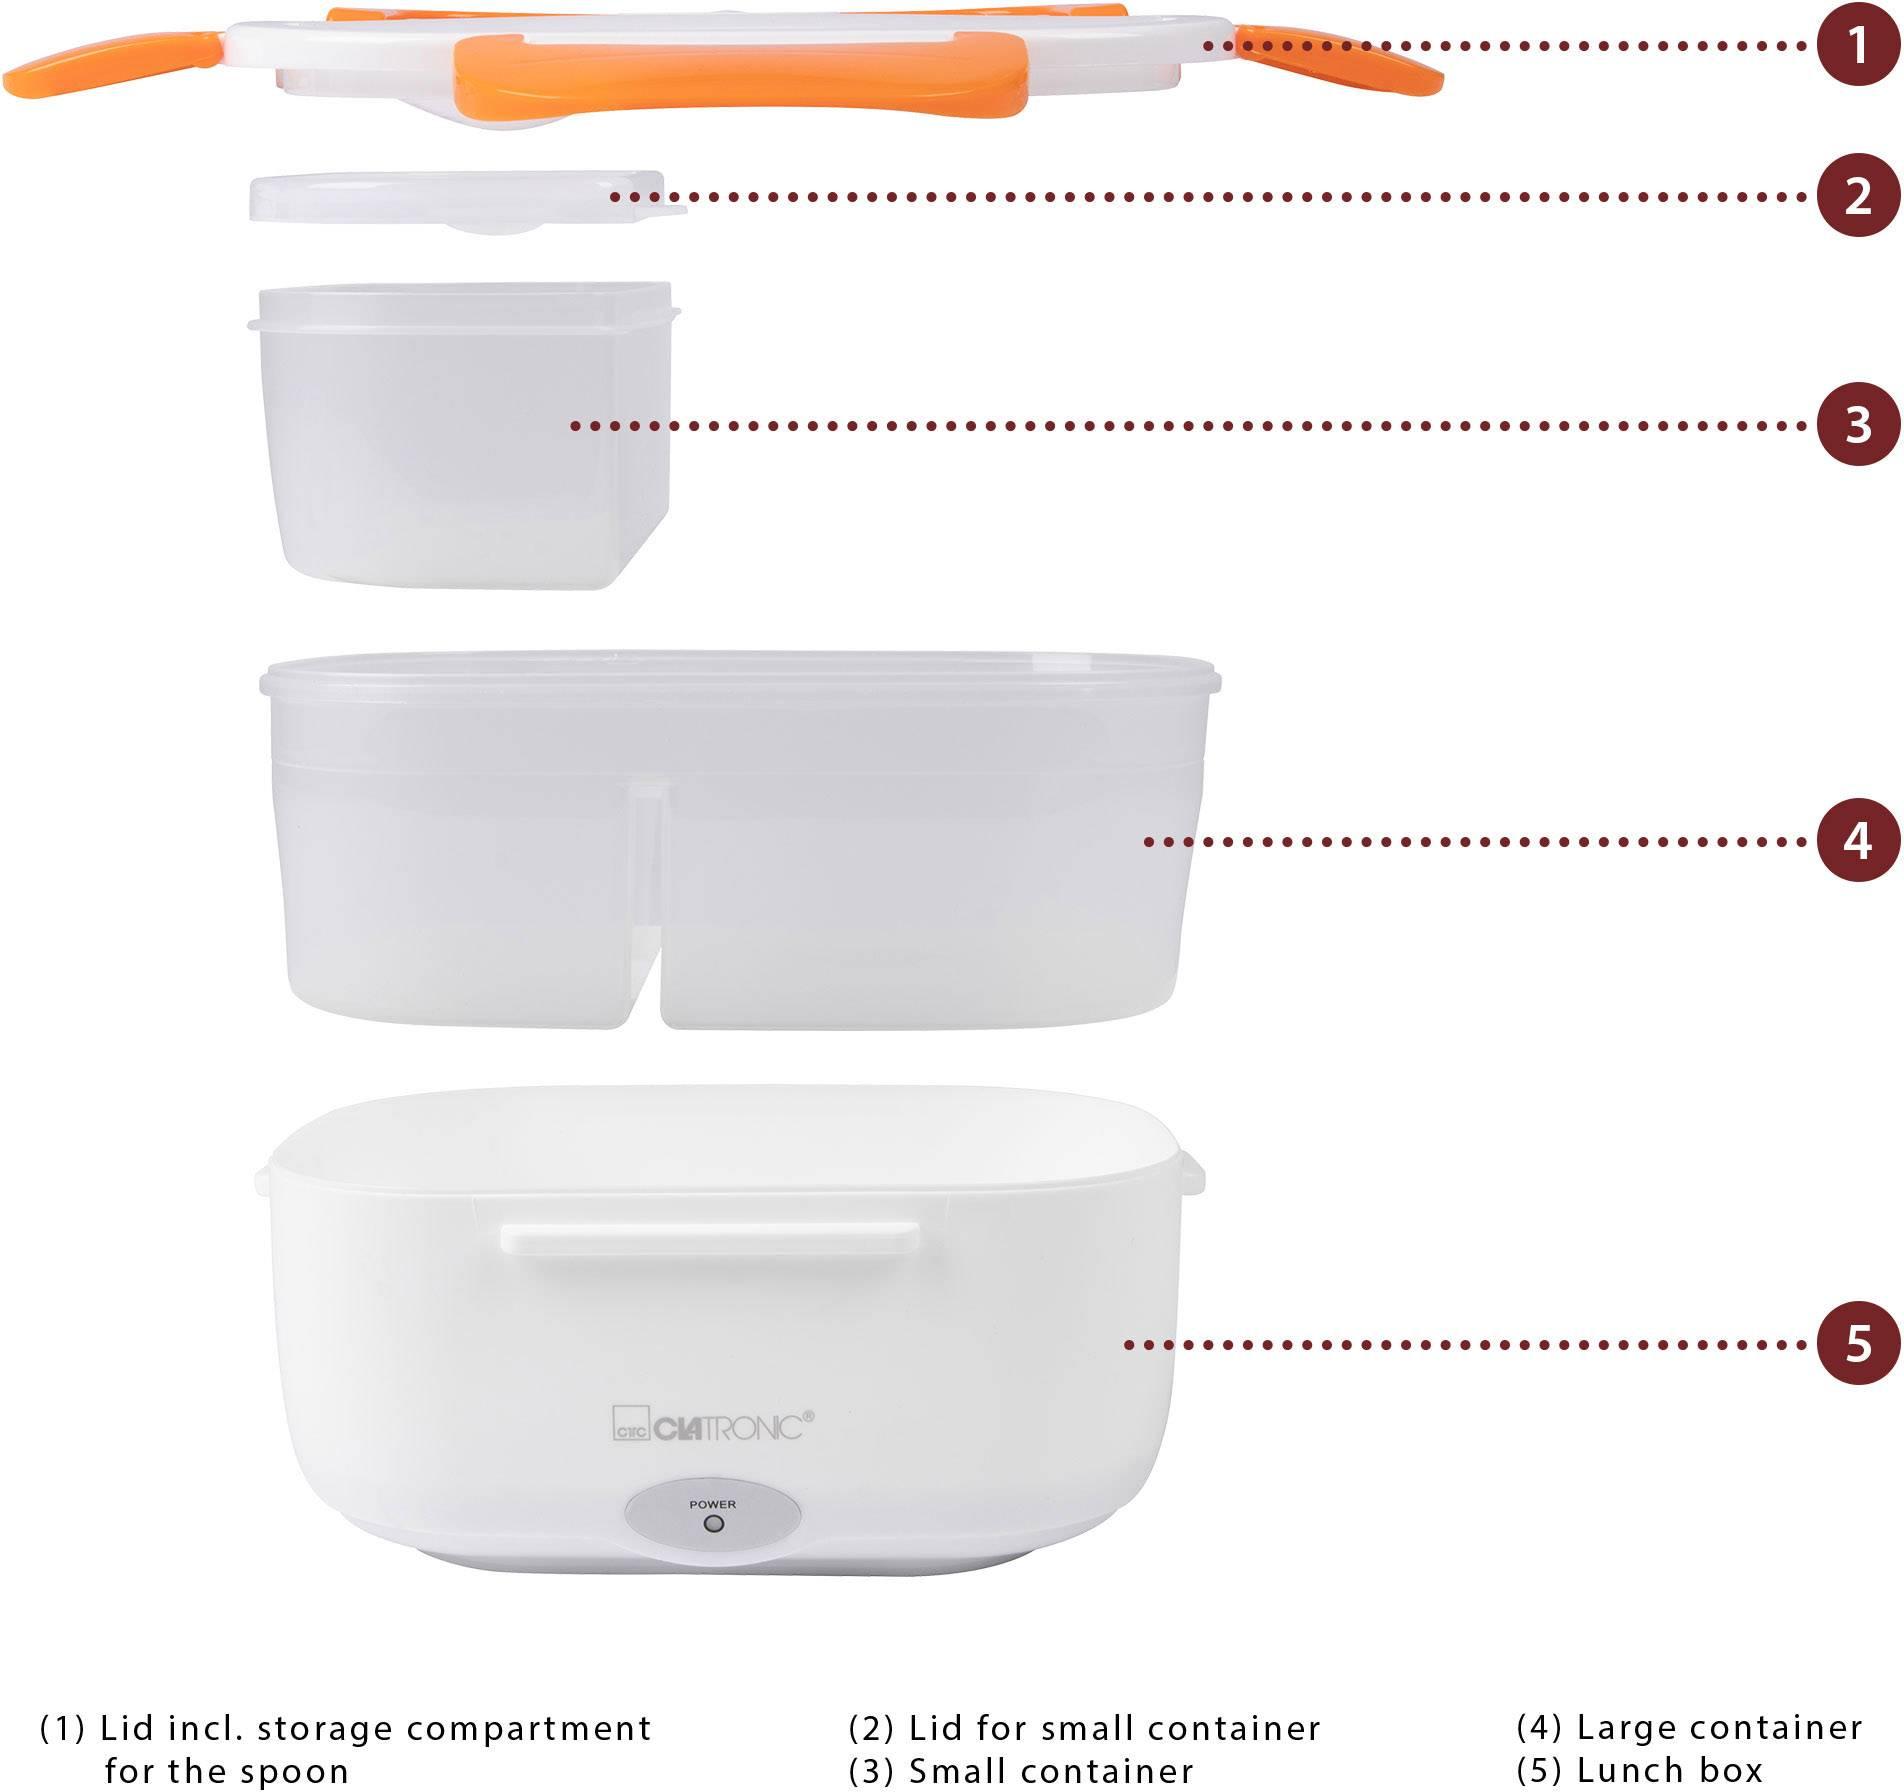 Clatronic LB 3719 263890 Electric lunchbox White, Orange   Conrad.com